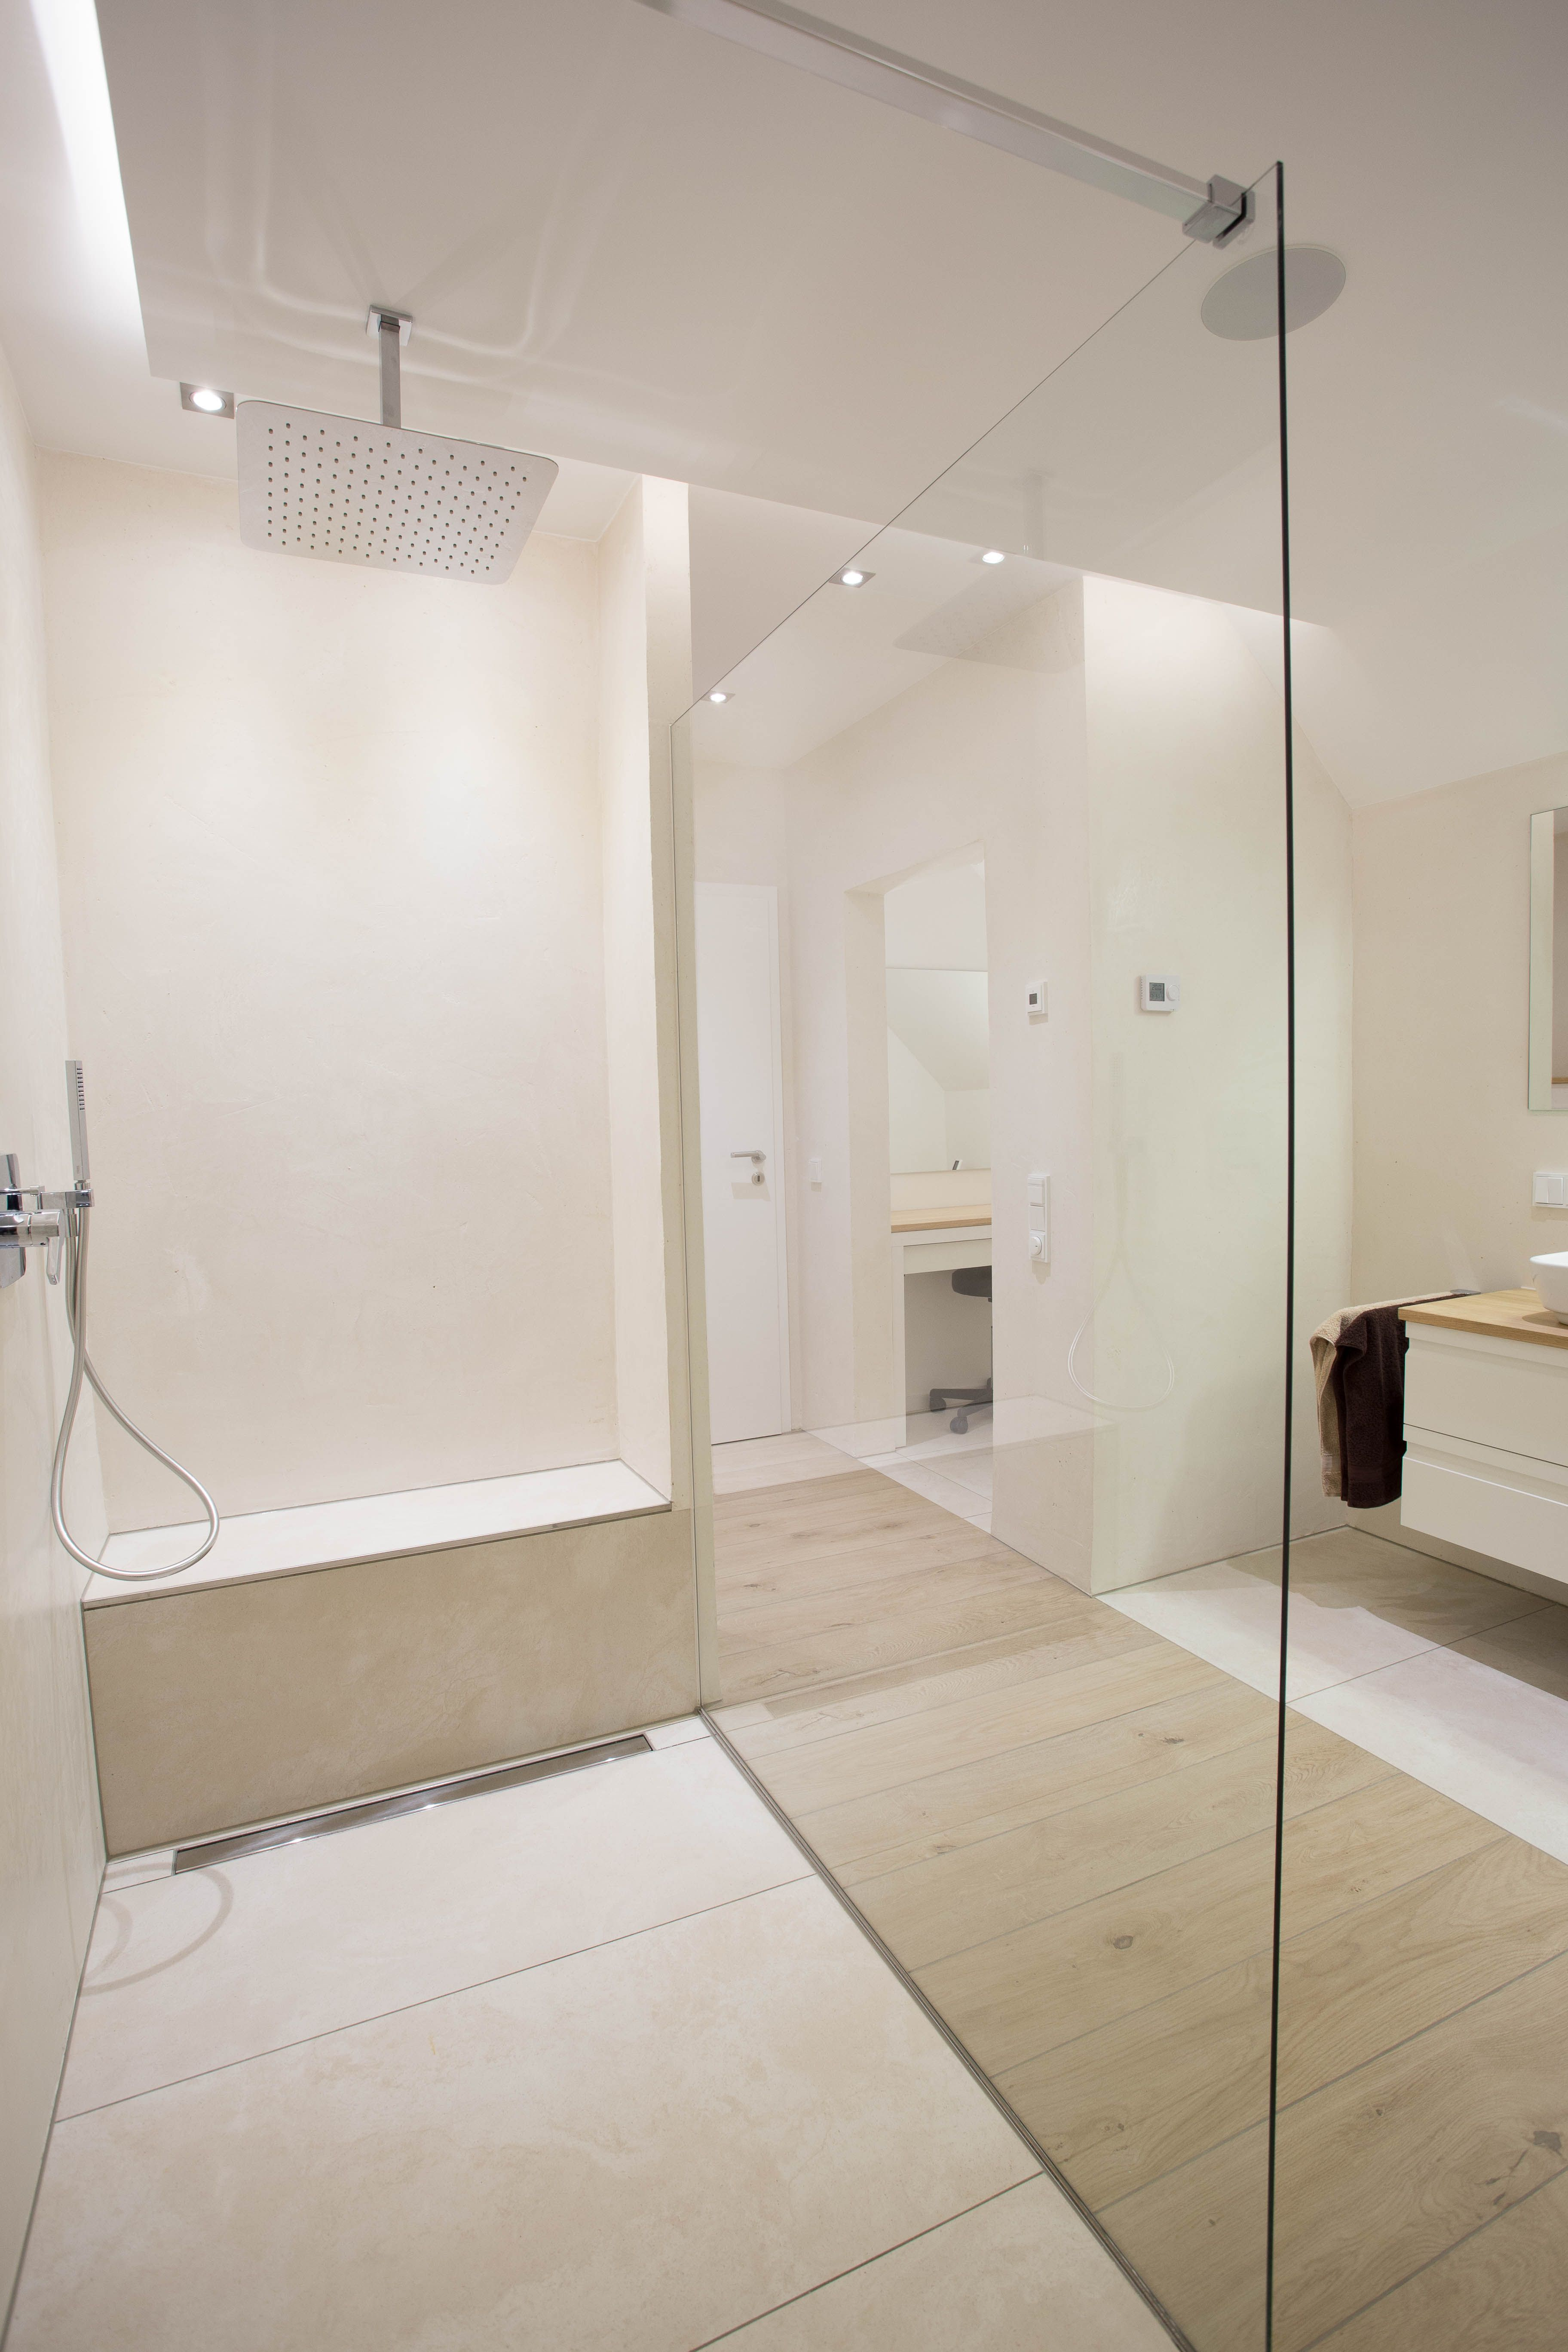 mineralischer edelputz in fugenloser dusche | badezimmer in 2018